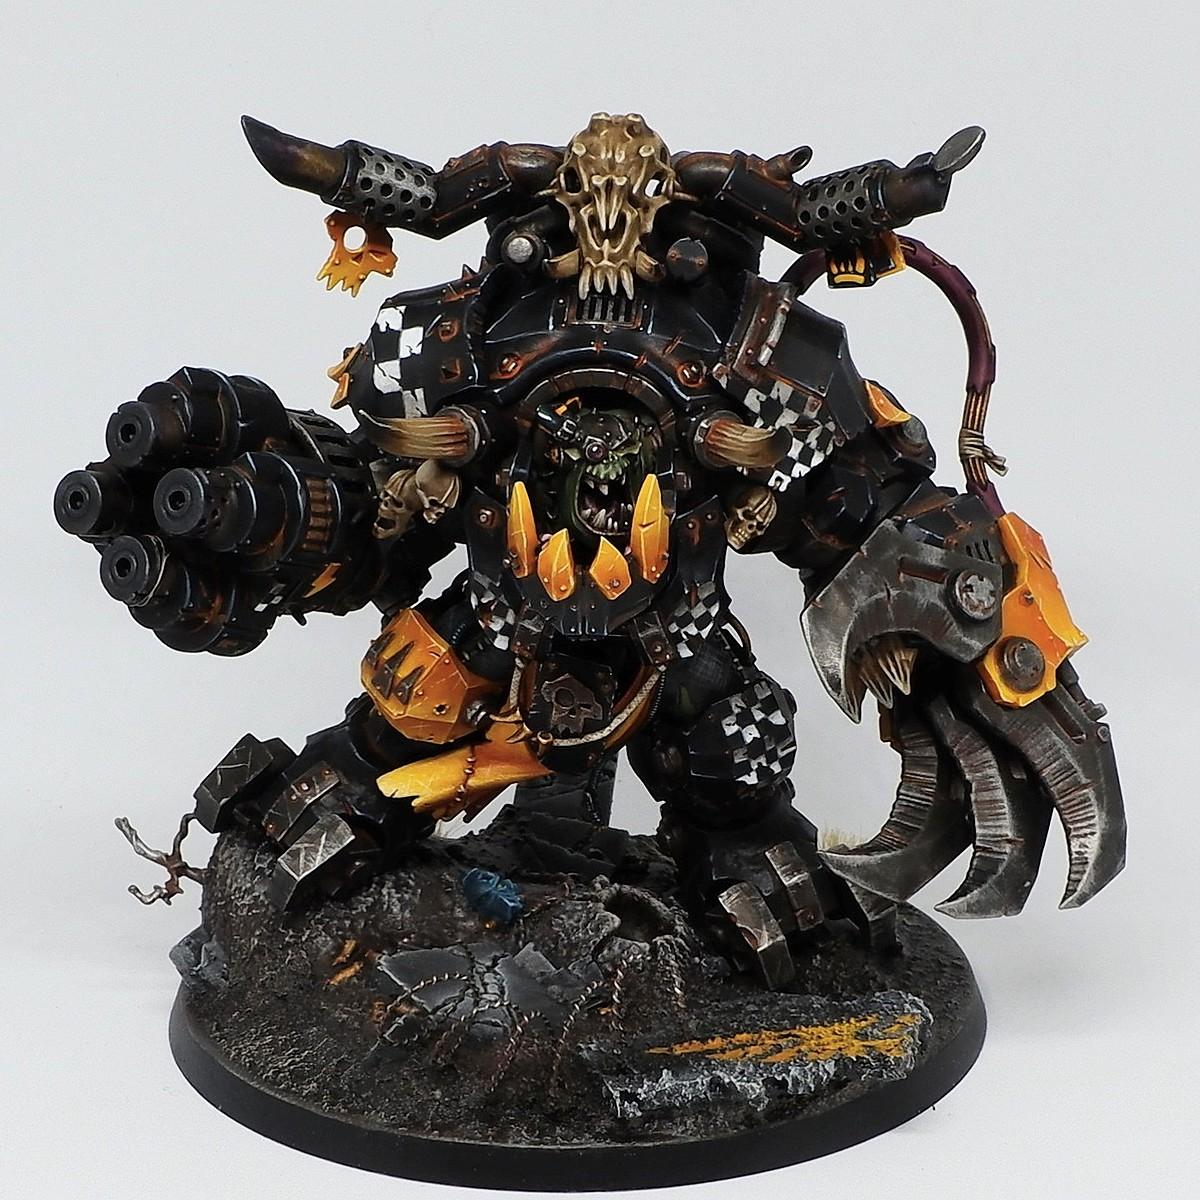 Ghazghkull Thraka - Rusted black